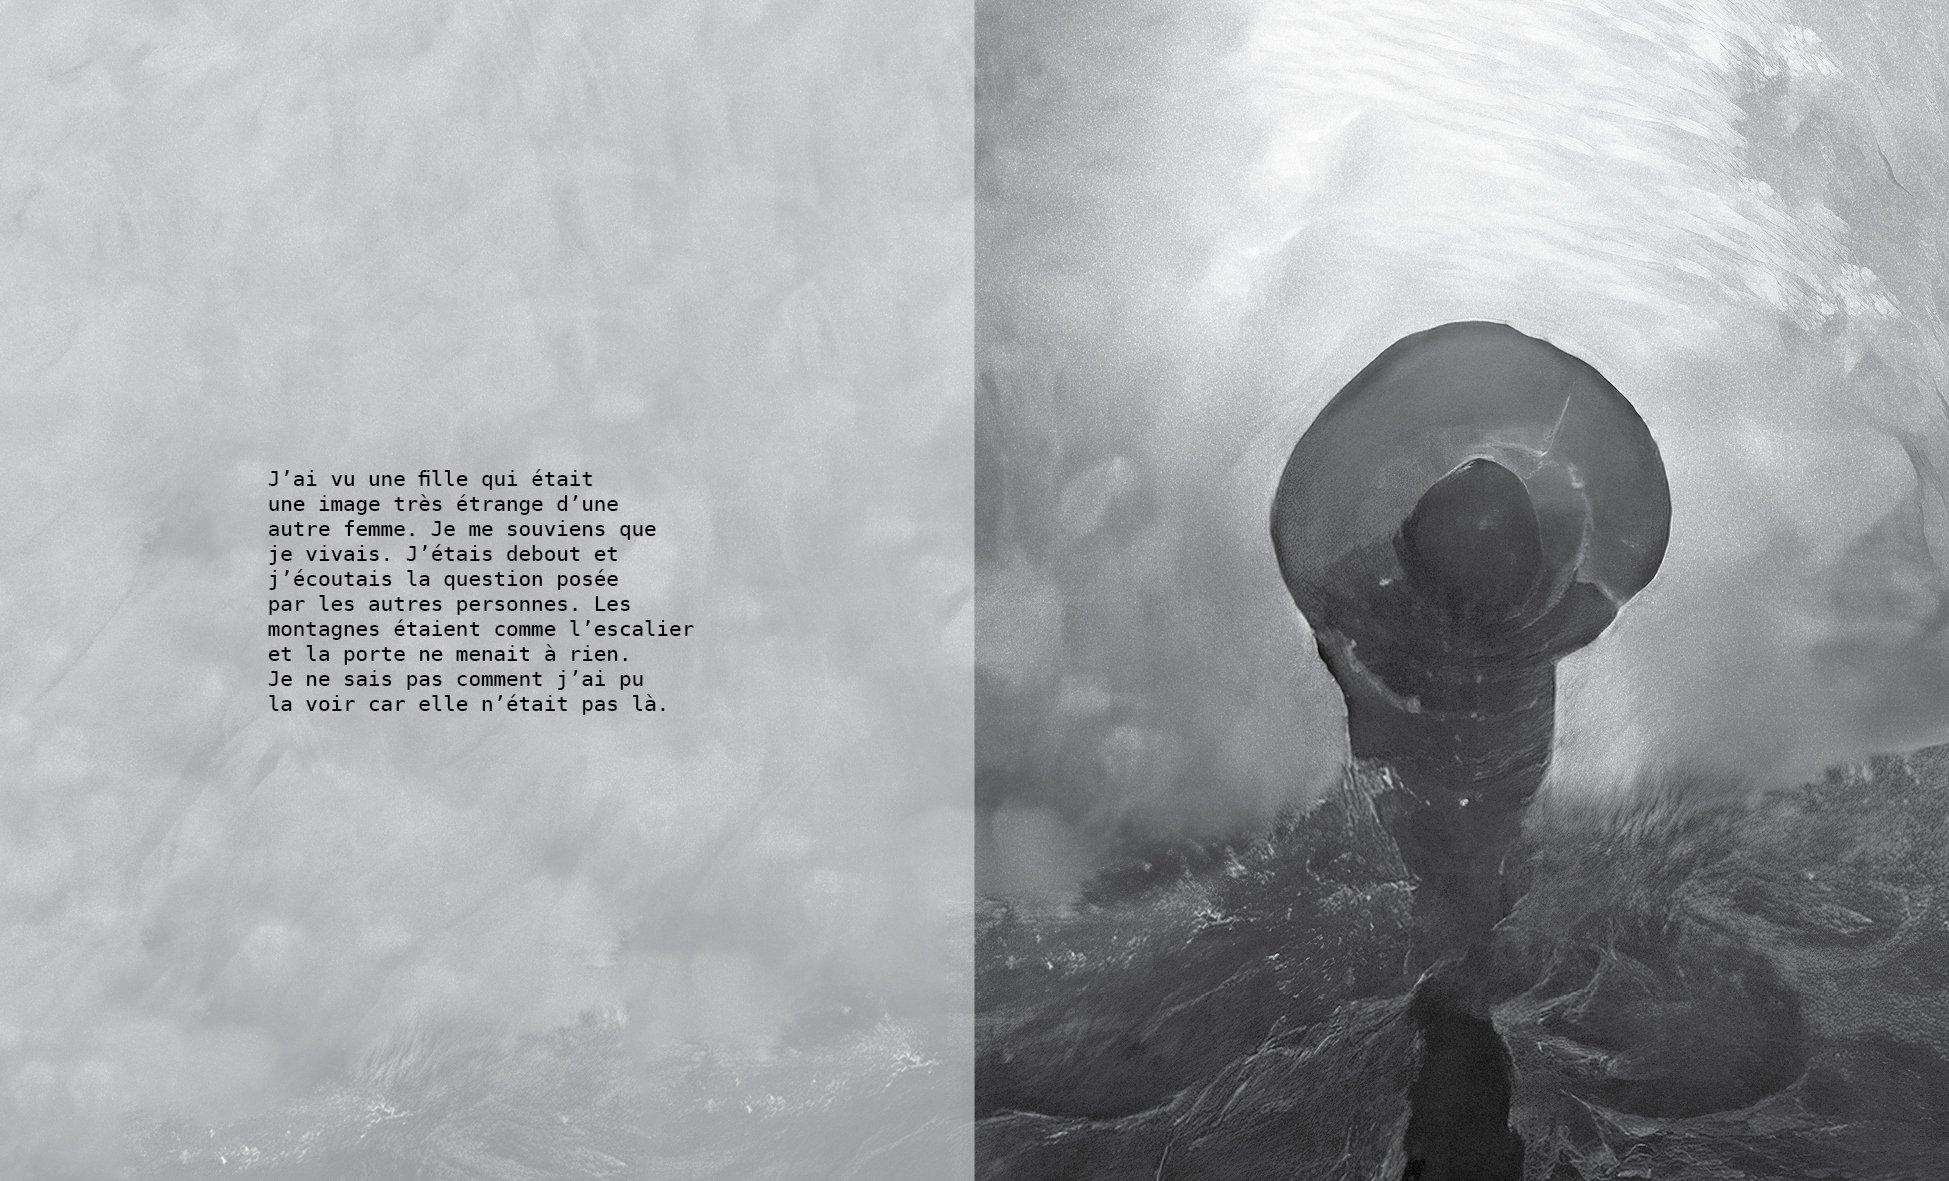 Apprentissage – Extinction – Résurrection / Grégory Chatonsky & Ariel Kyrou